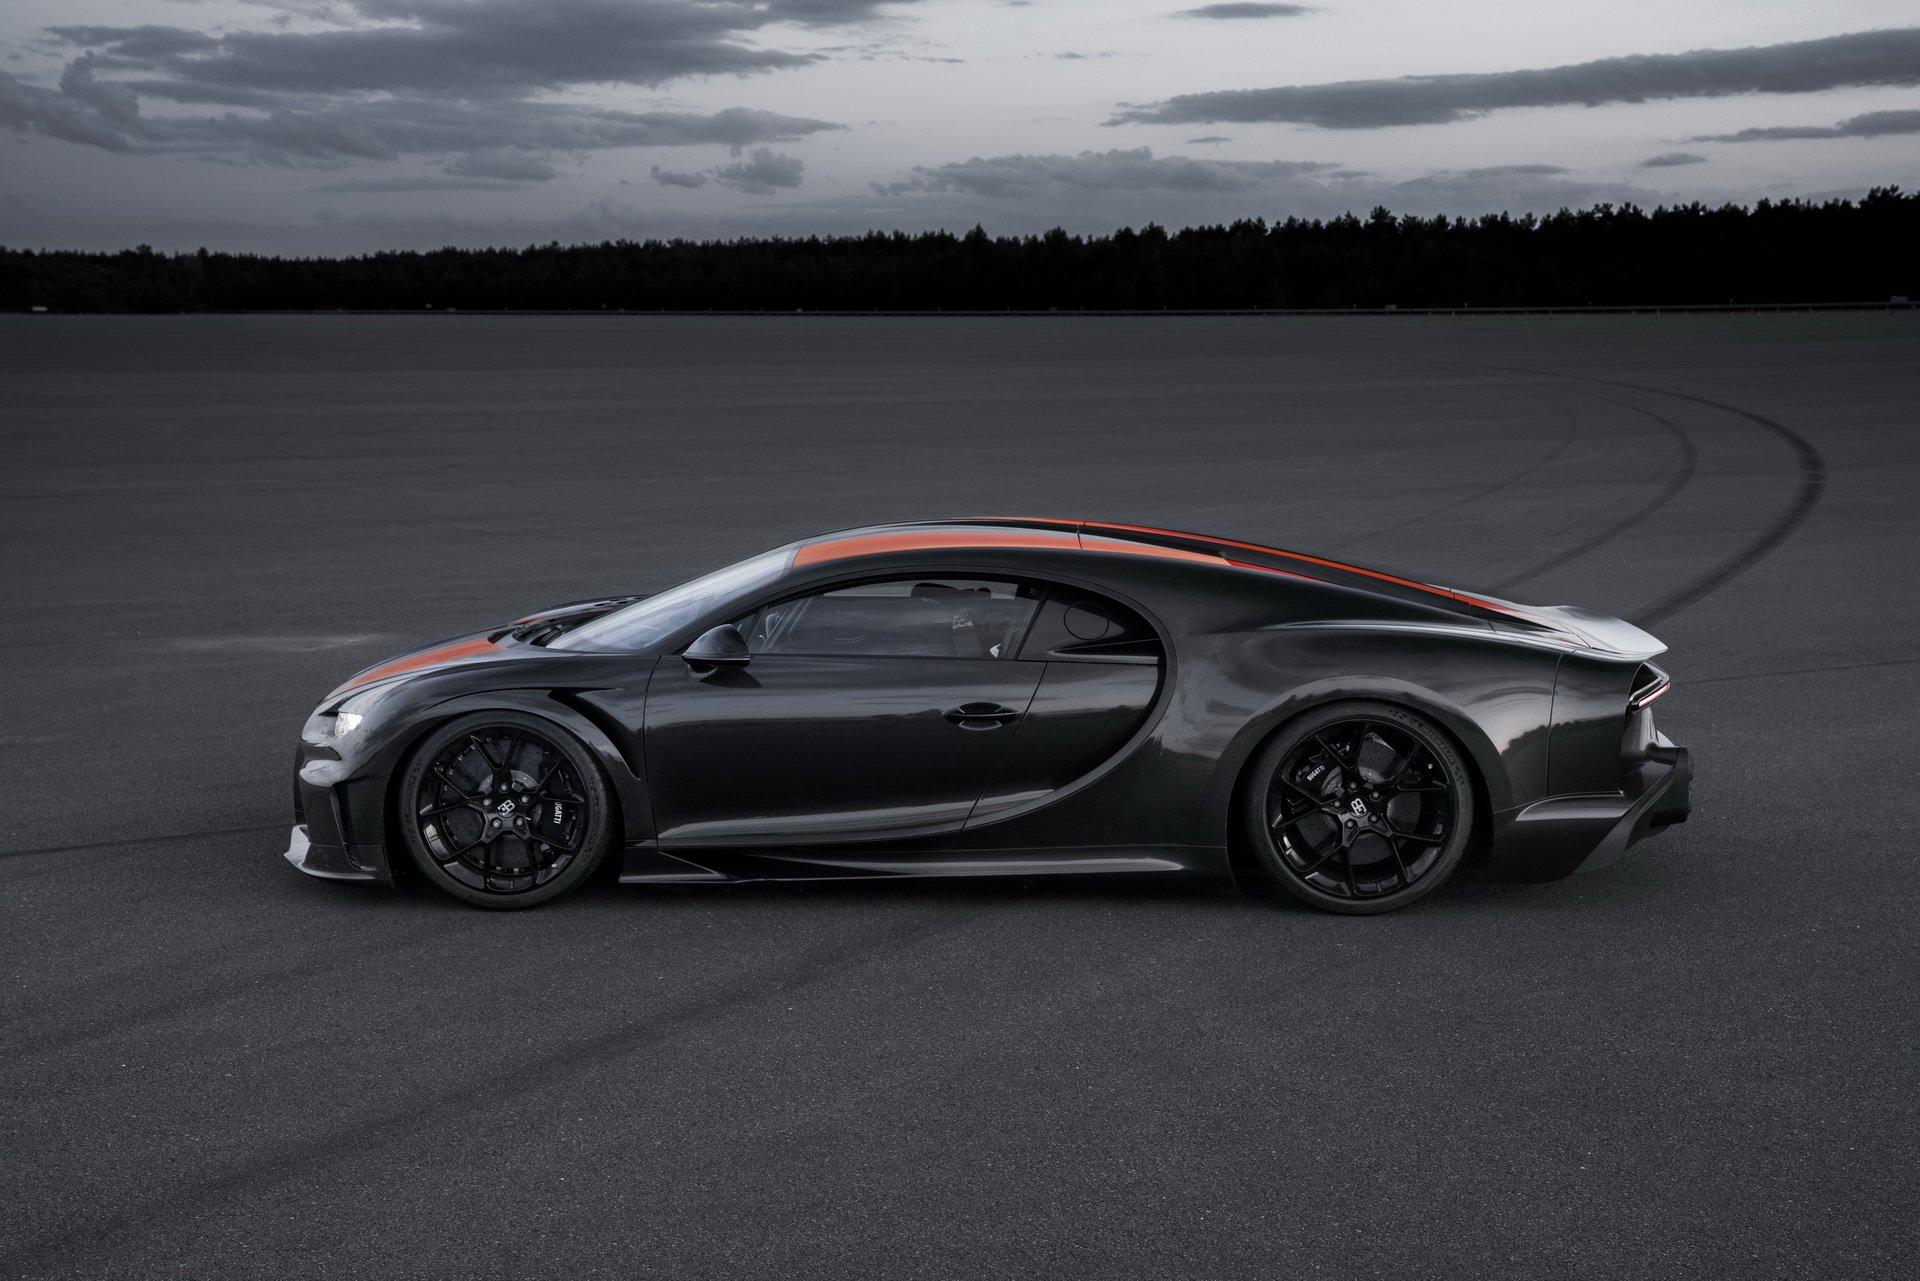 bugatti-chiron-topspeedrun-02.jpg